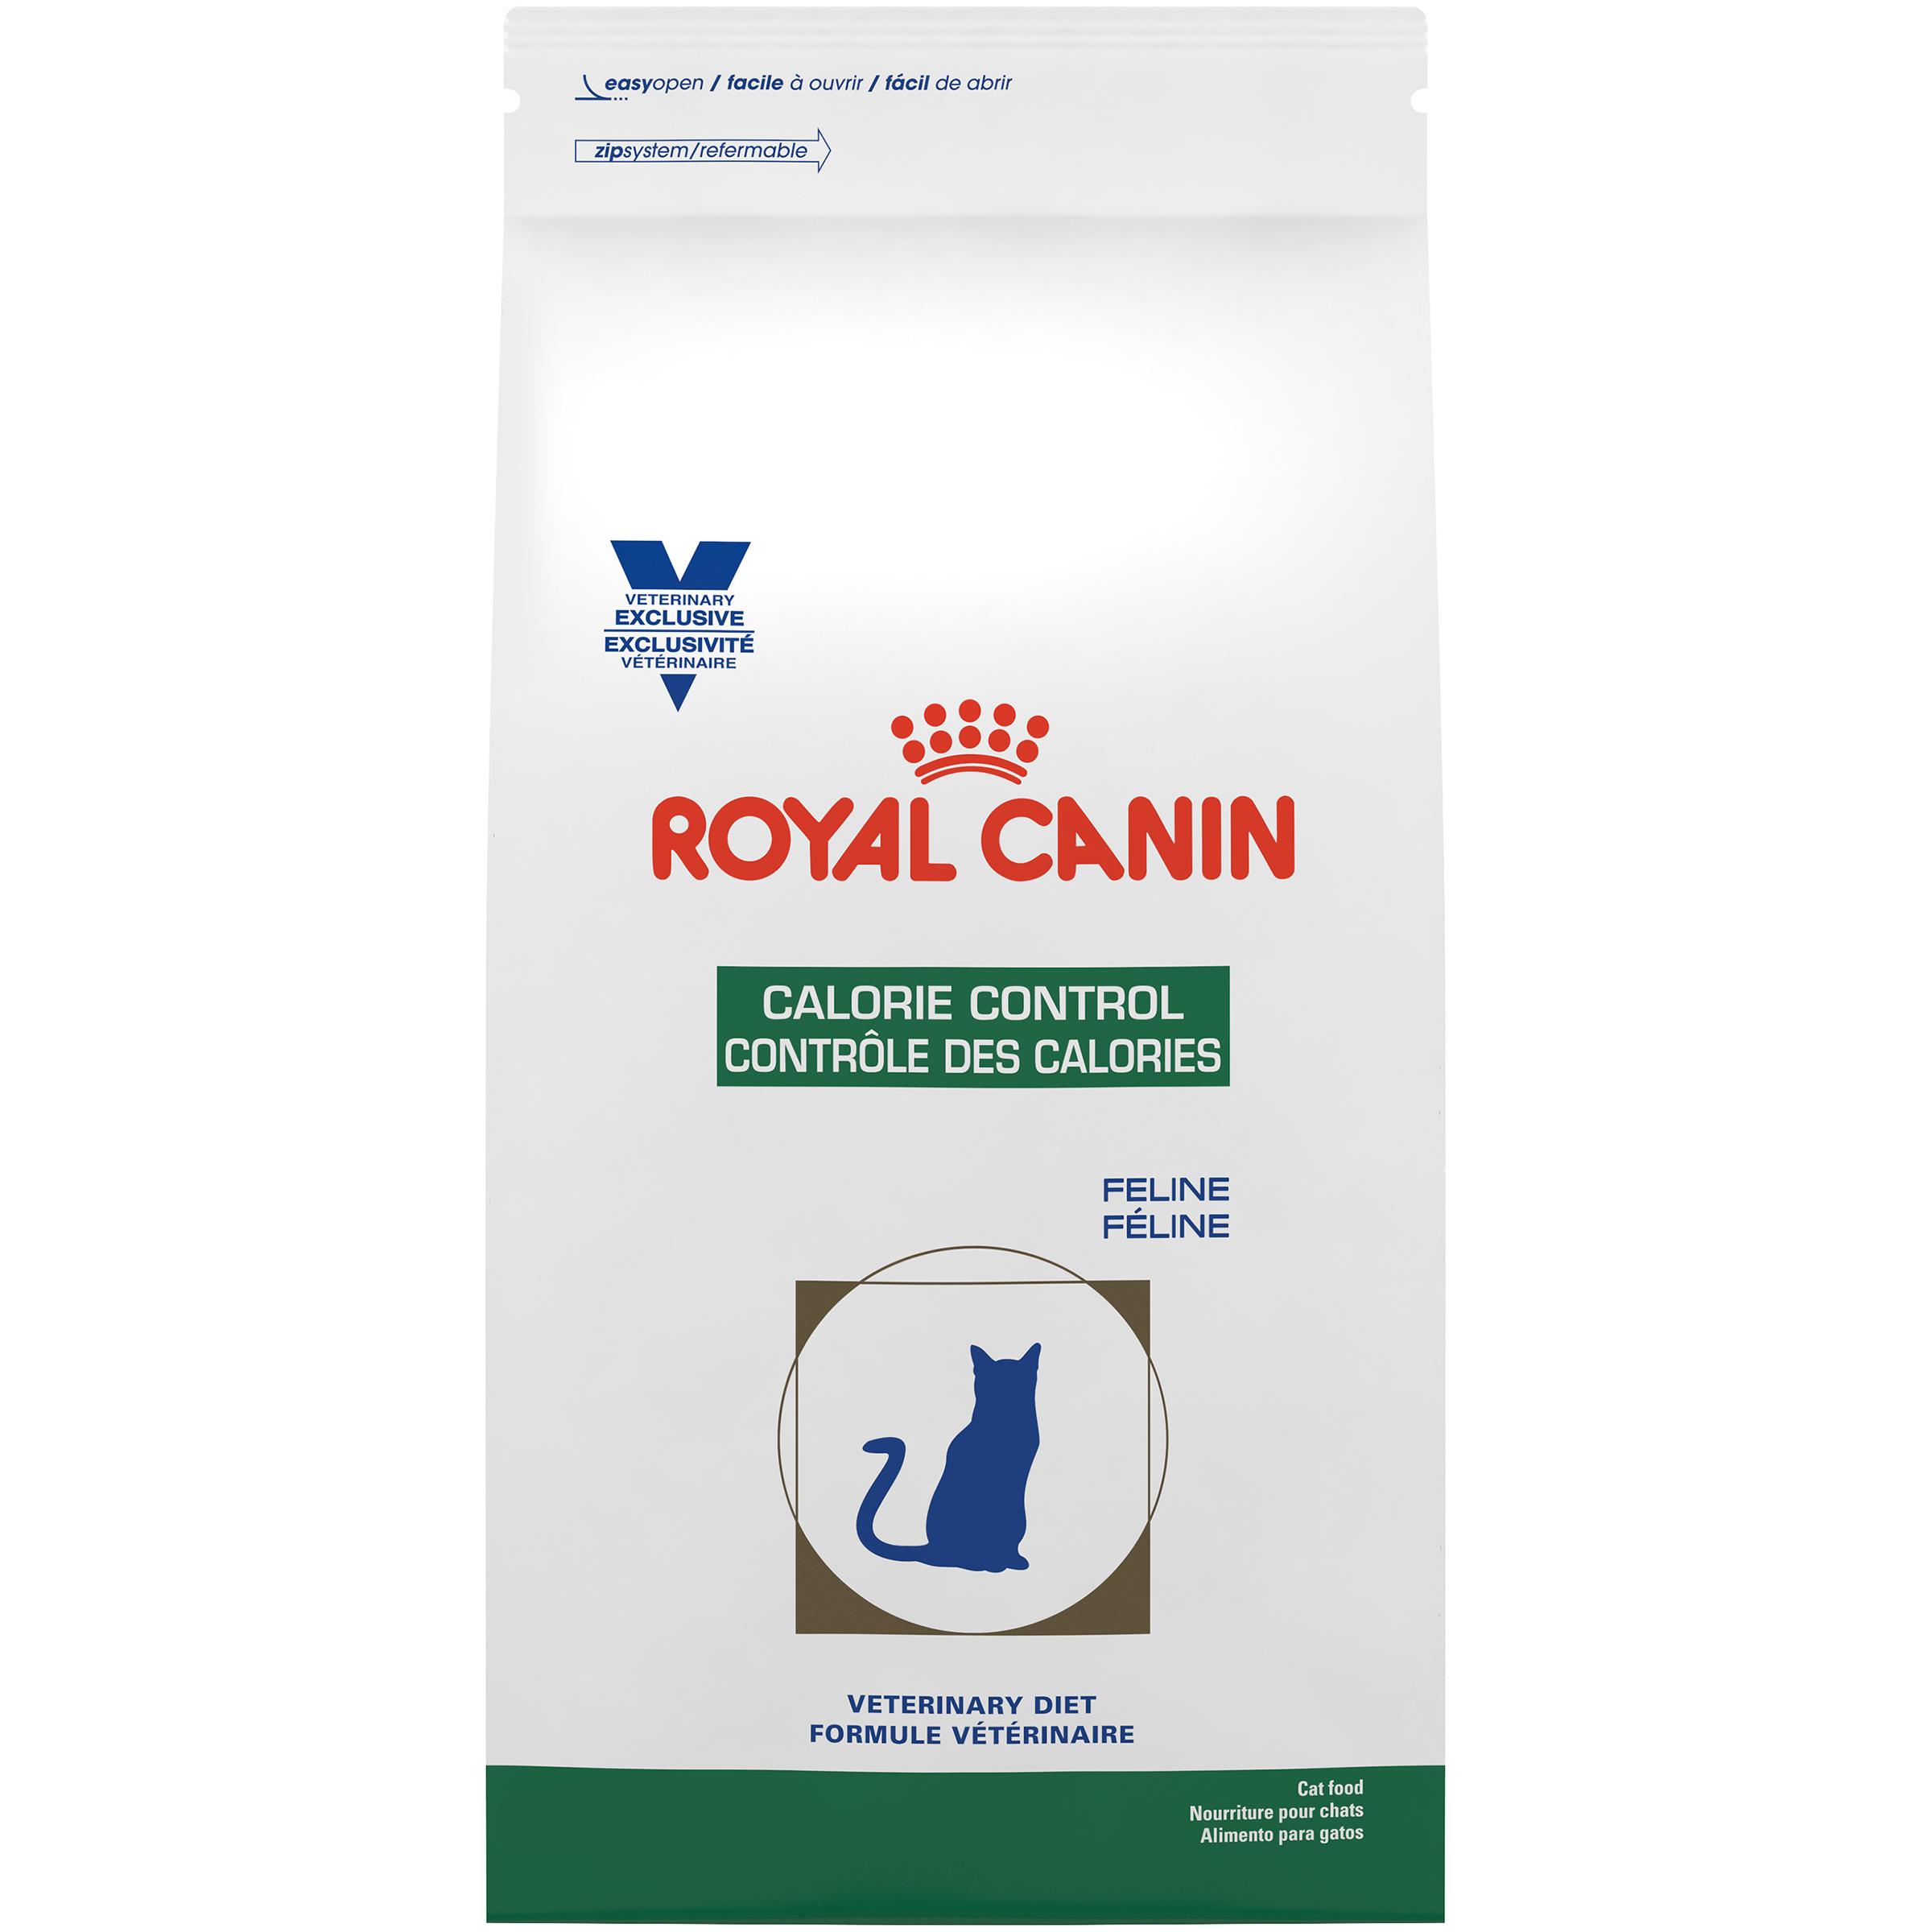 Royal Canin Veterinary Diet Feline Calorie Control Dry Cat Food